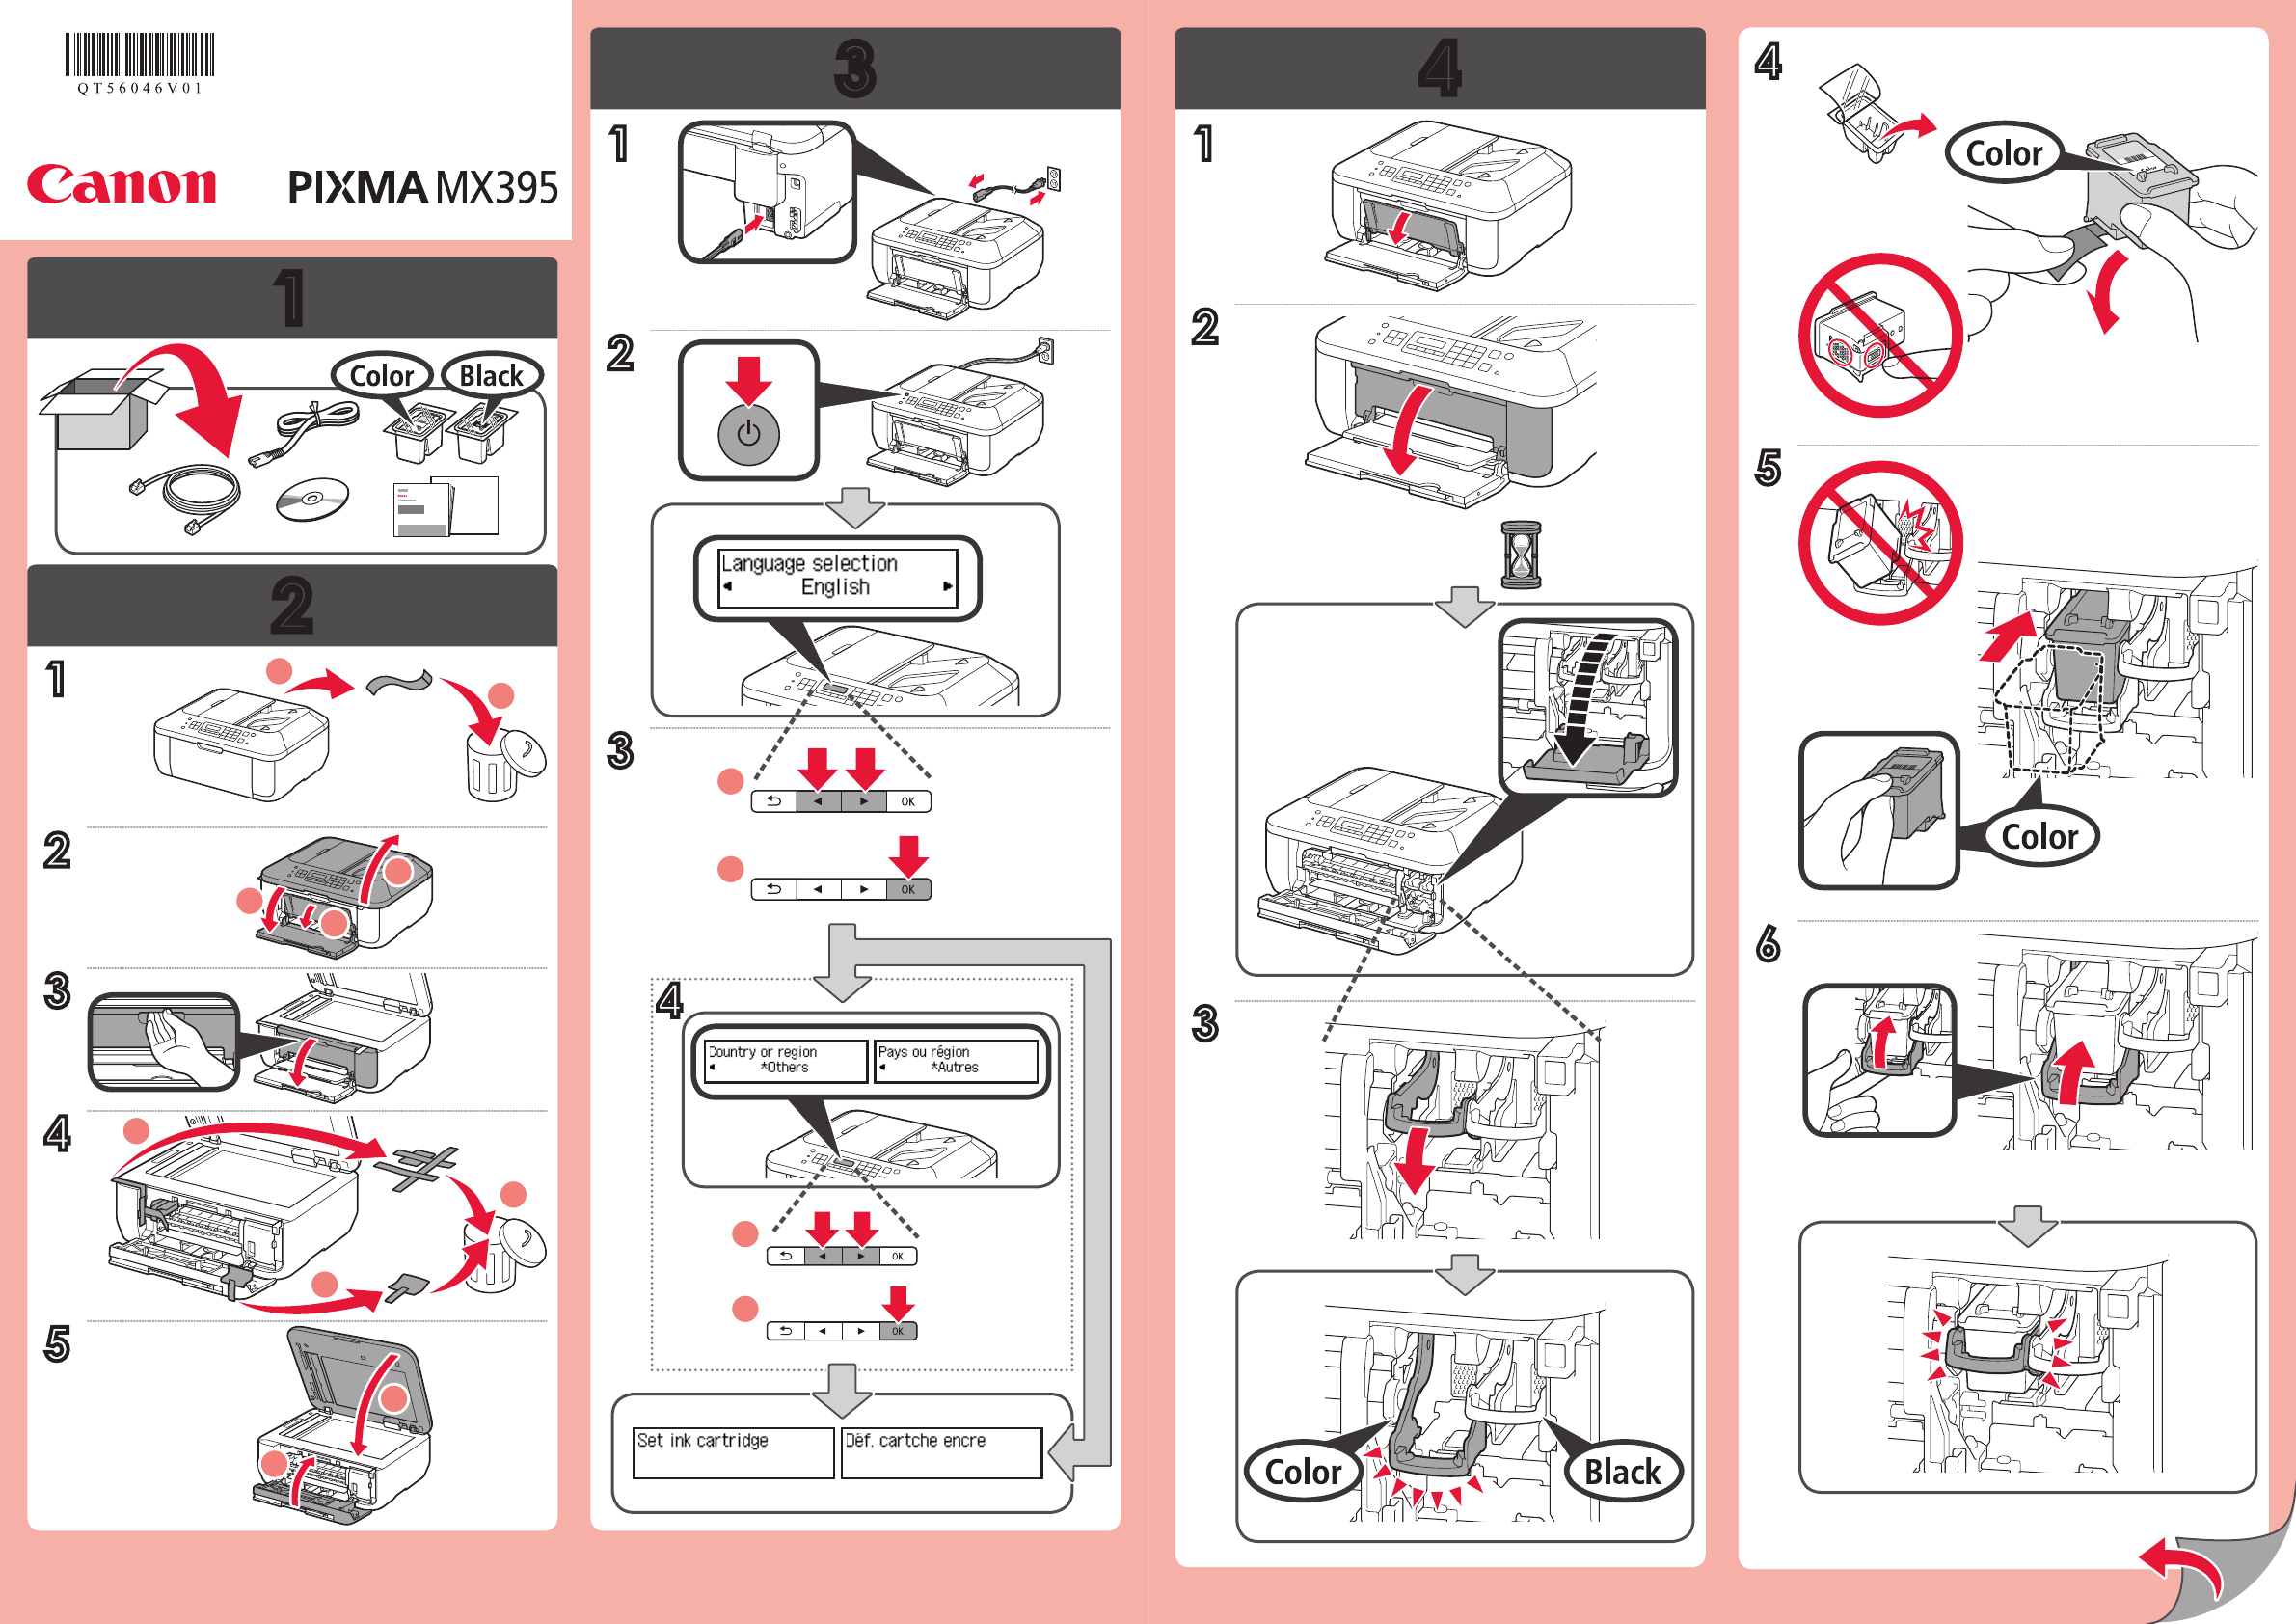 handleiding canon pixma mx 395 series pagina 1 van 2 alle talen. Black Bedroom Furniture Sets. Home Design Ideas